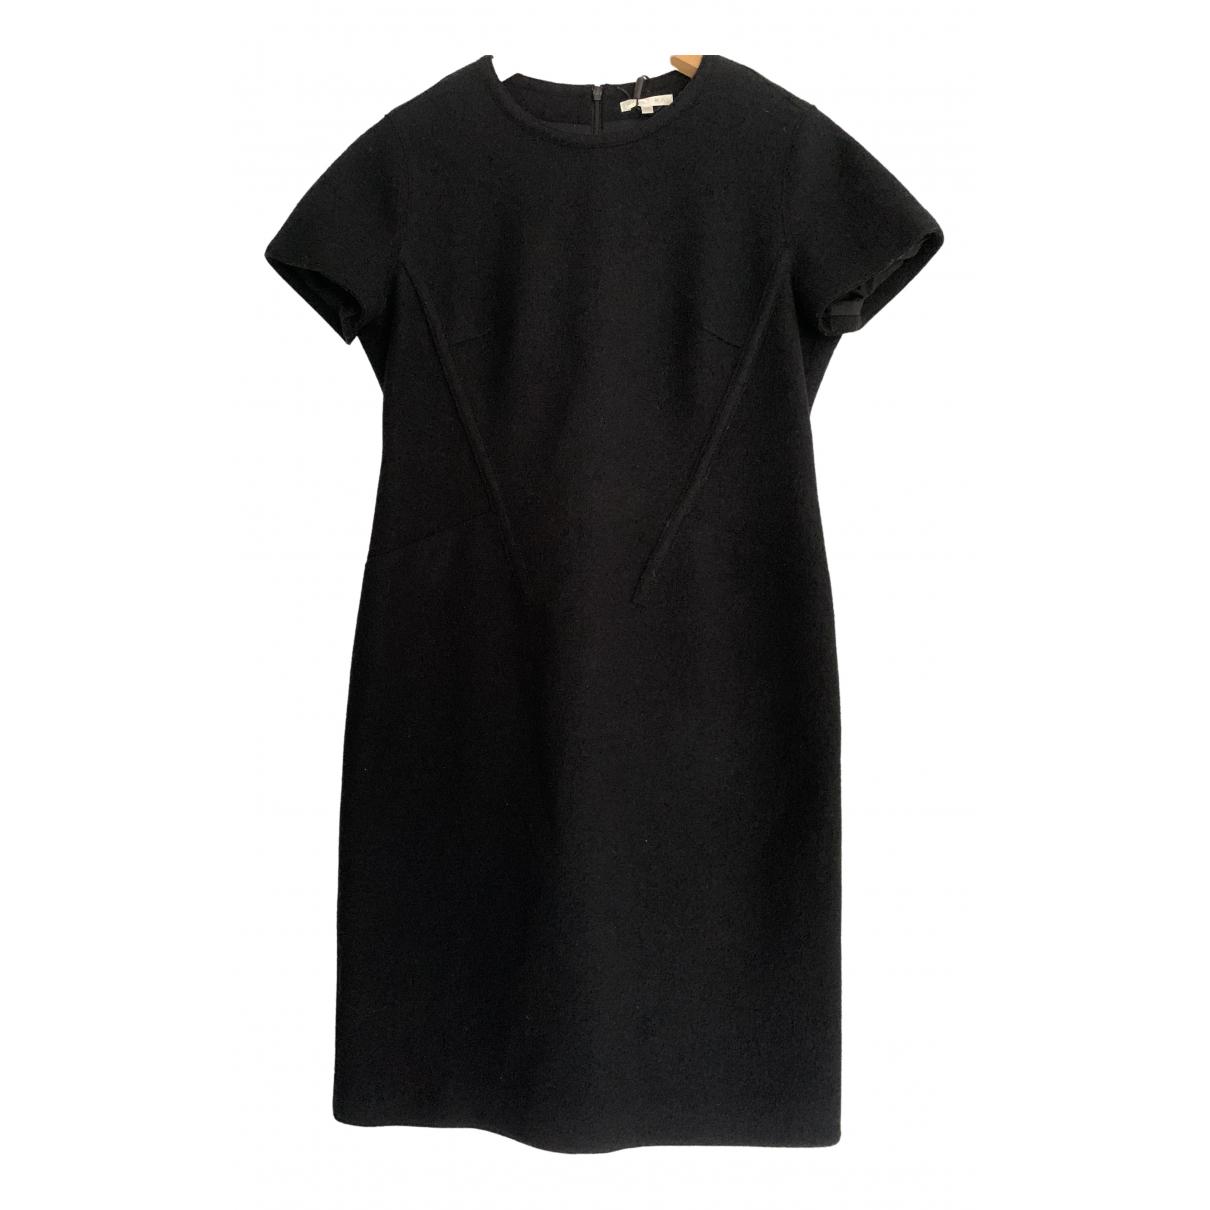 Paule Ka \N Black Wool dress for Women 44 FR